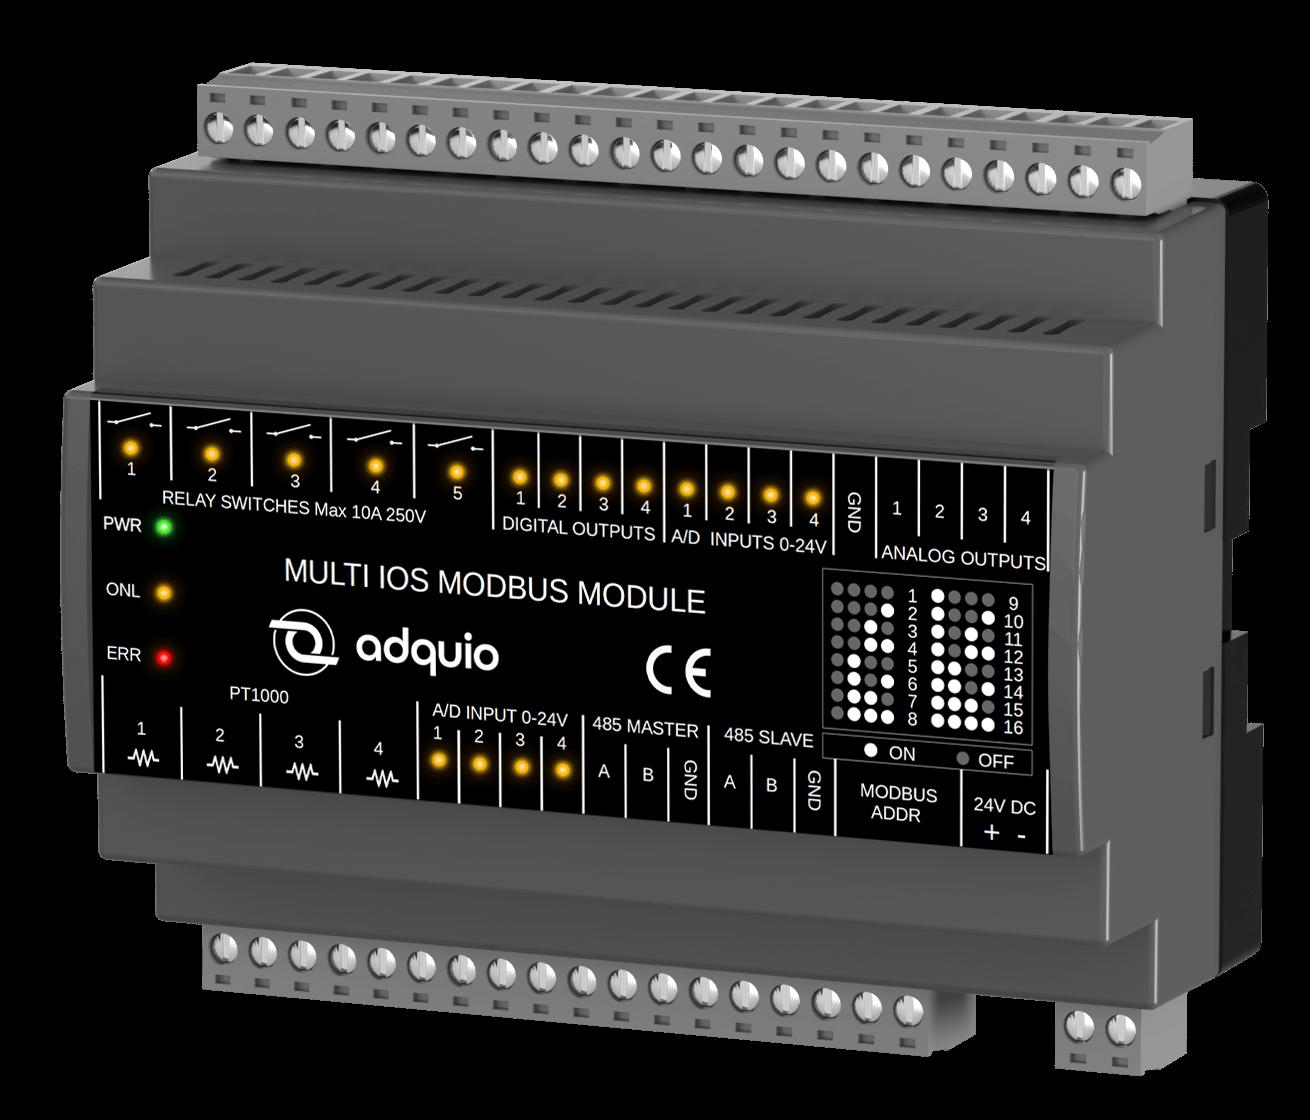 Vista frontal de adquio multi IOs modbus module